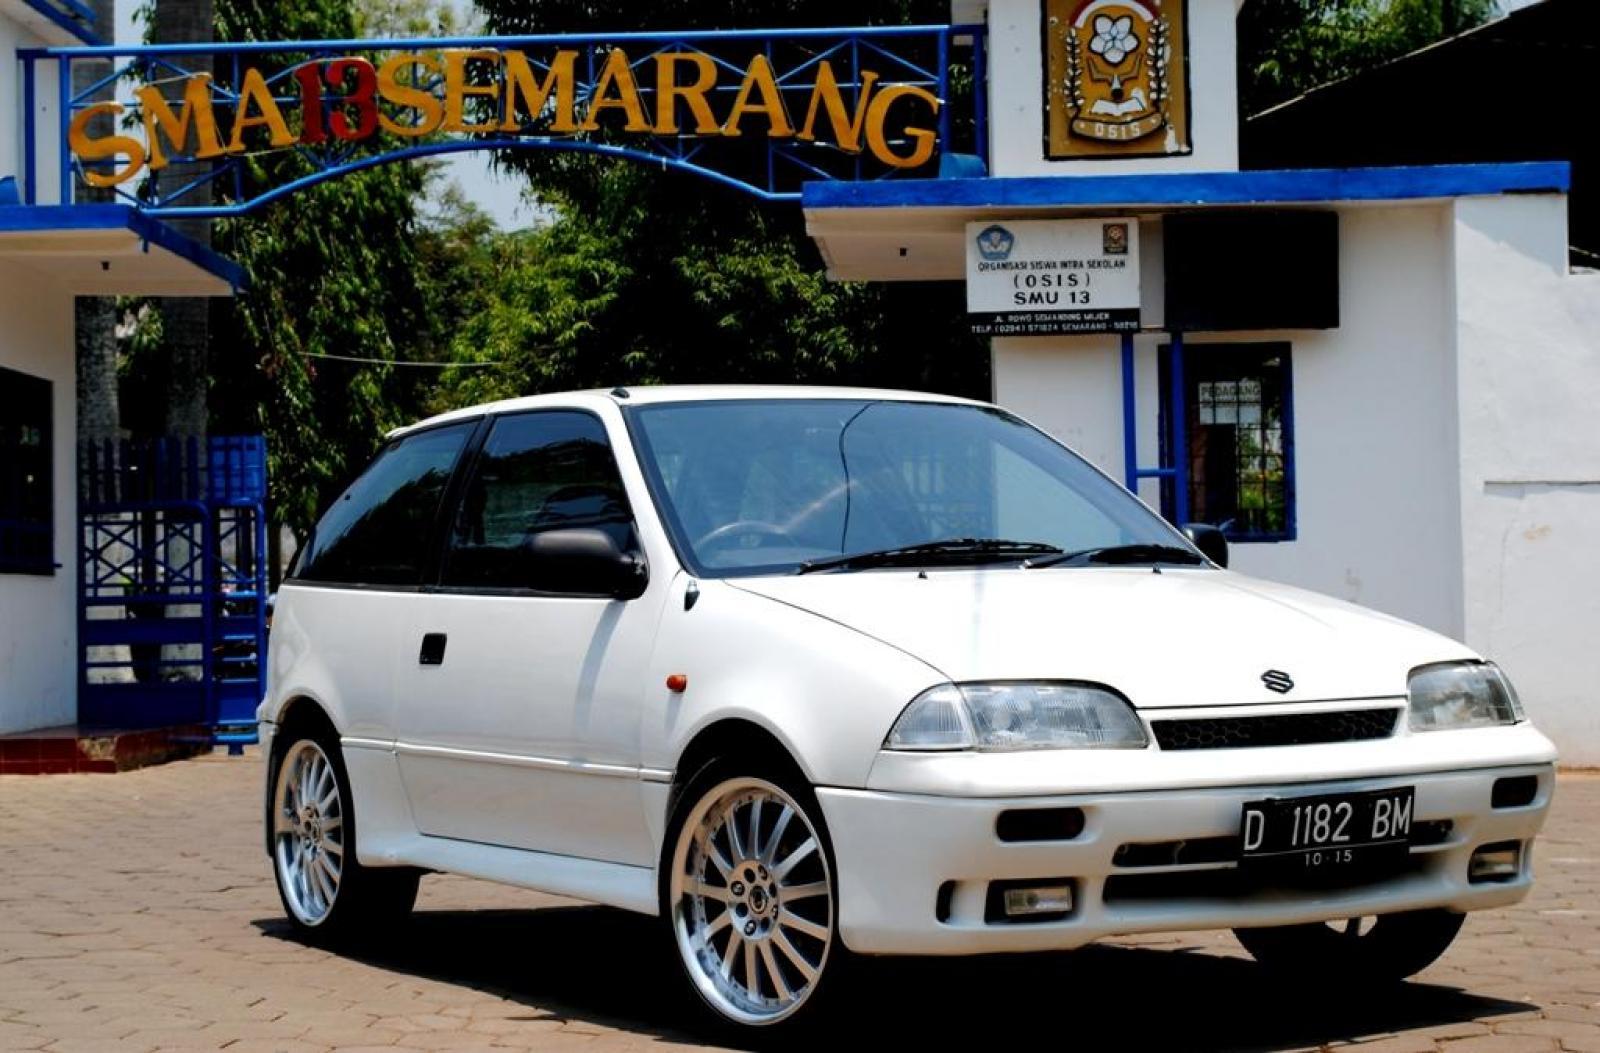 1990 Suzuki Swift - Information and photos - Zomb Drive